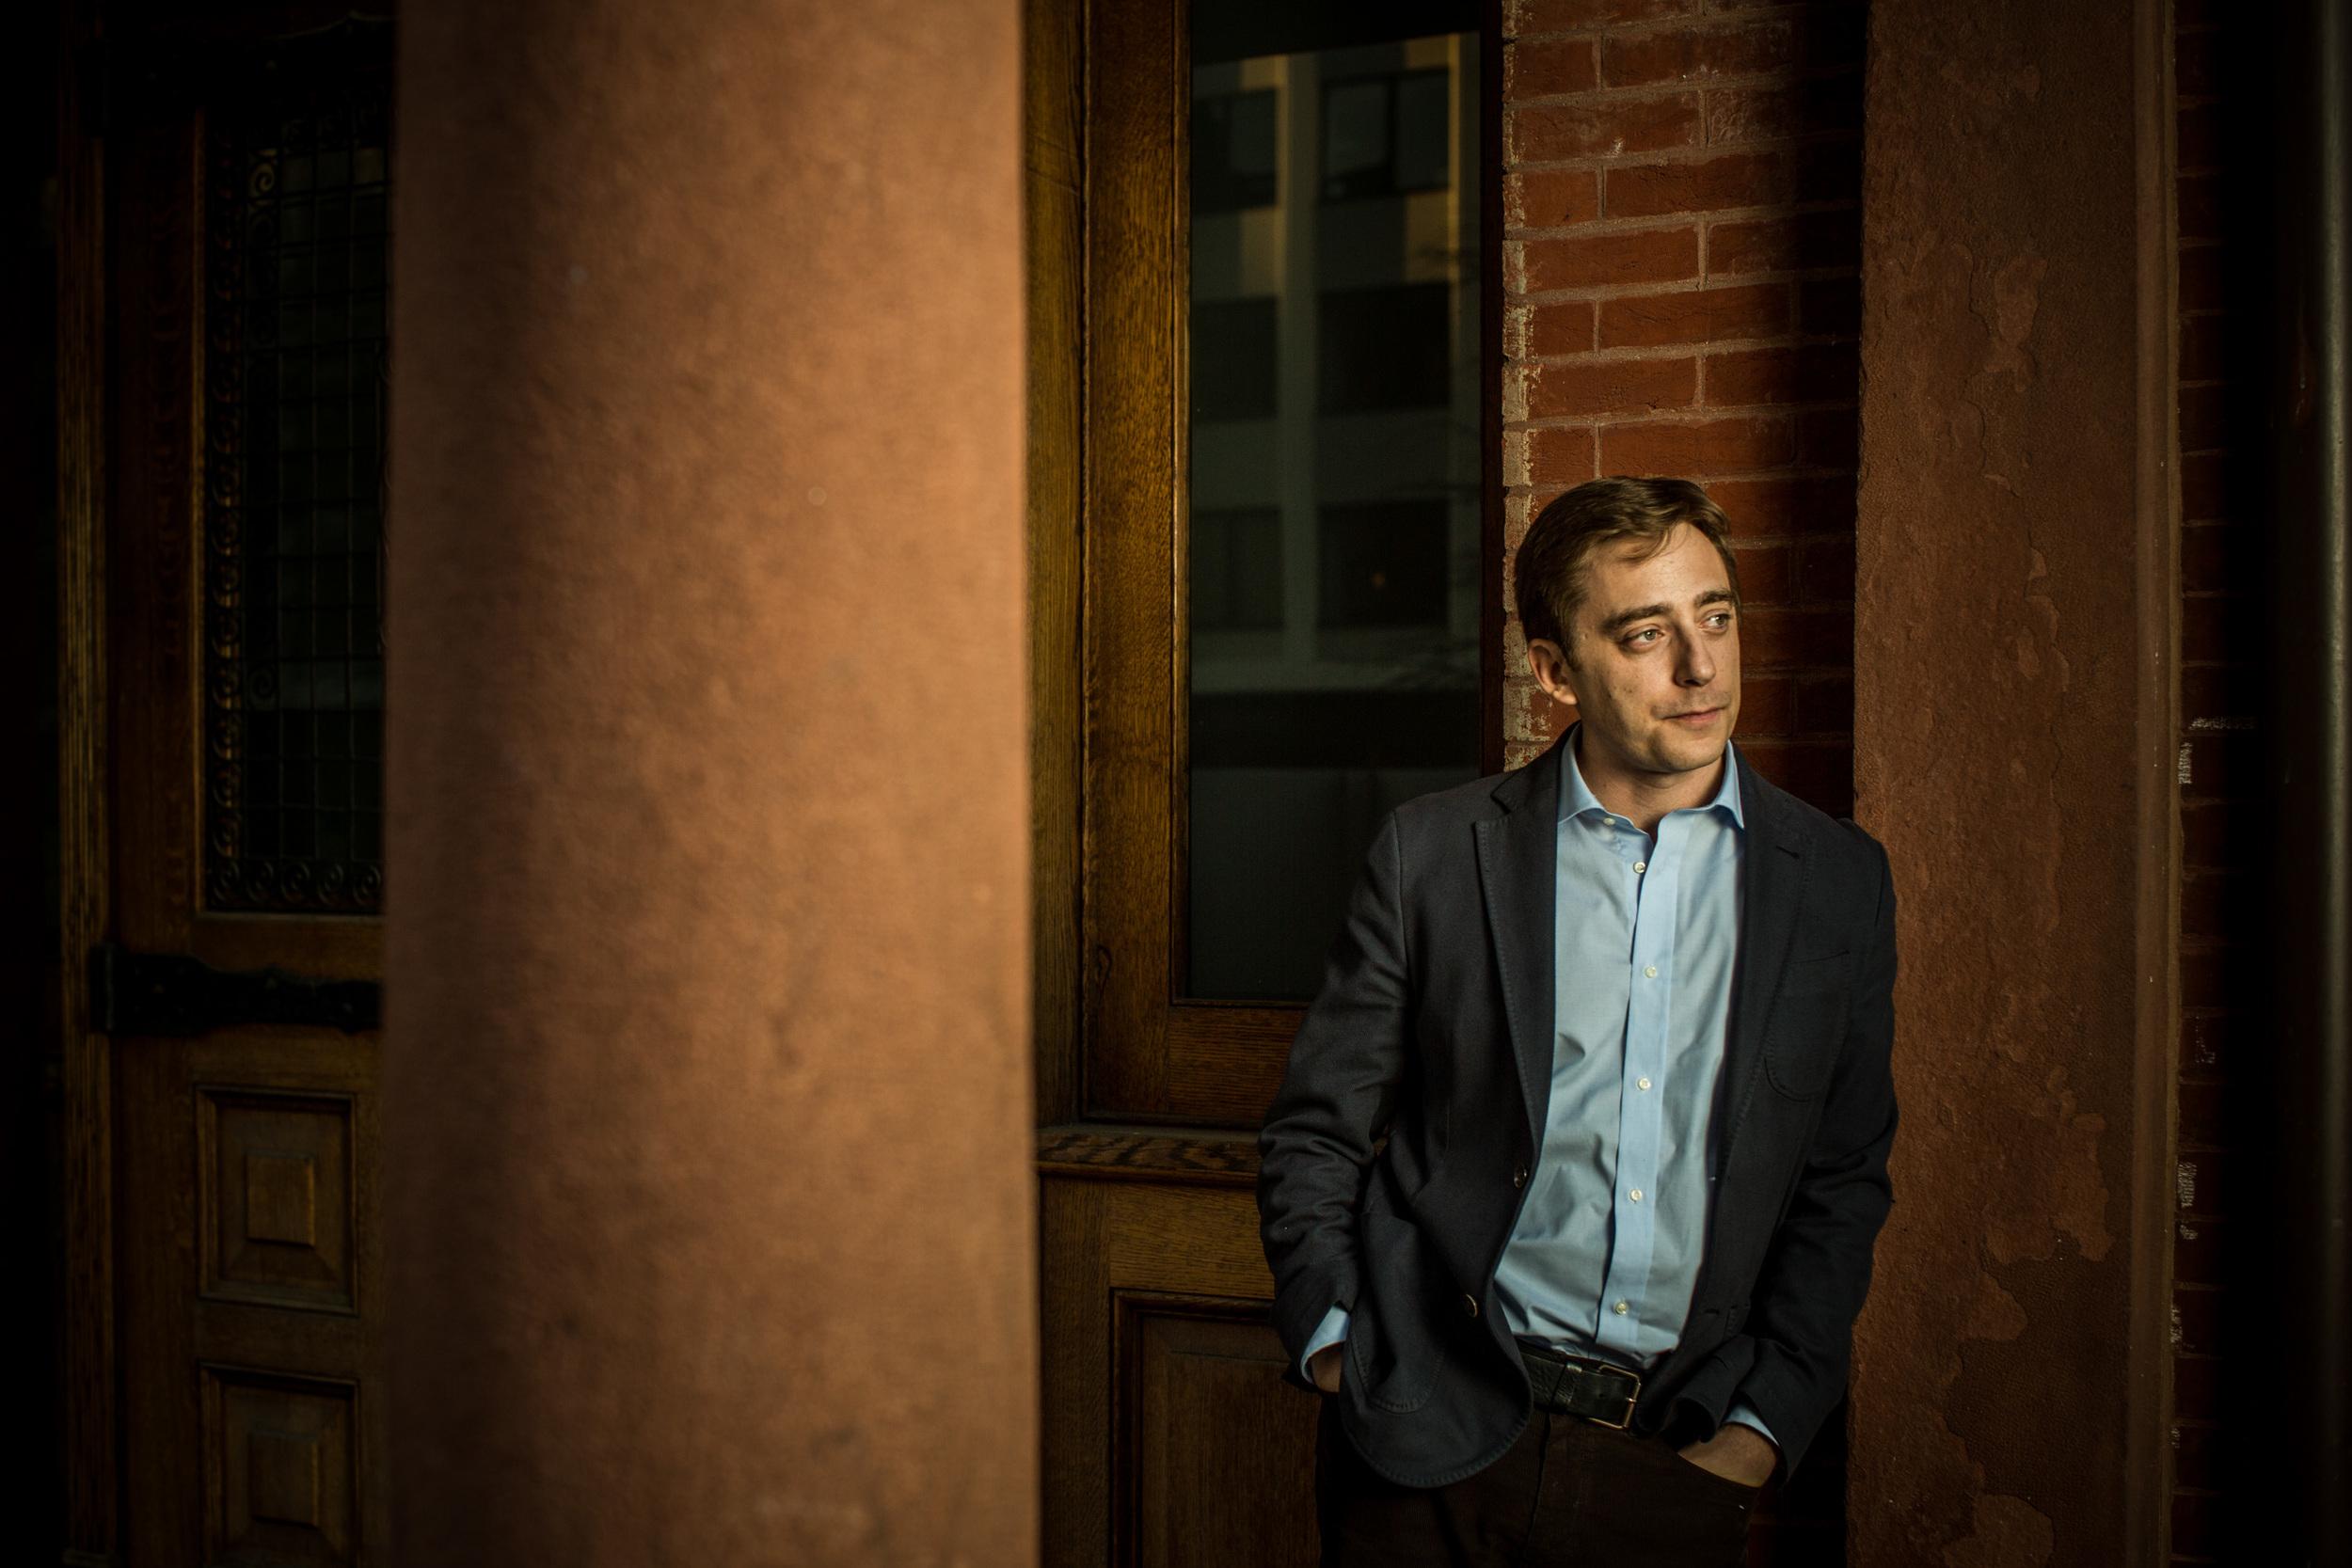 New Yorker staff writer Evan Osnos